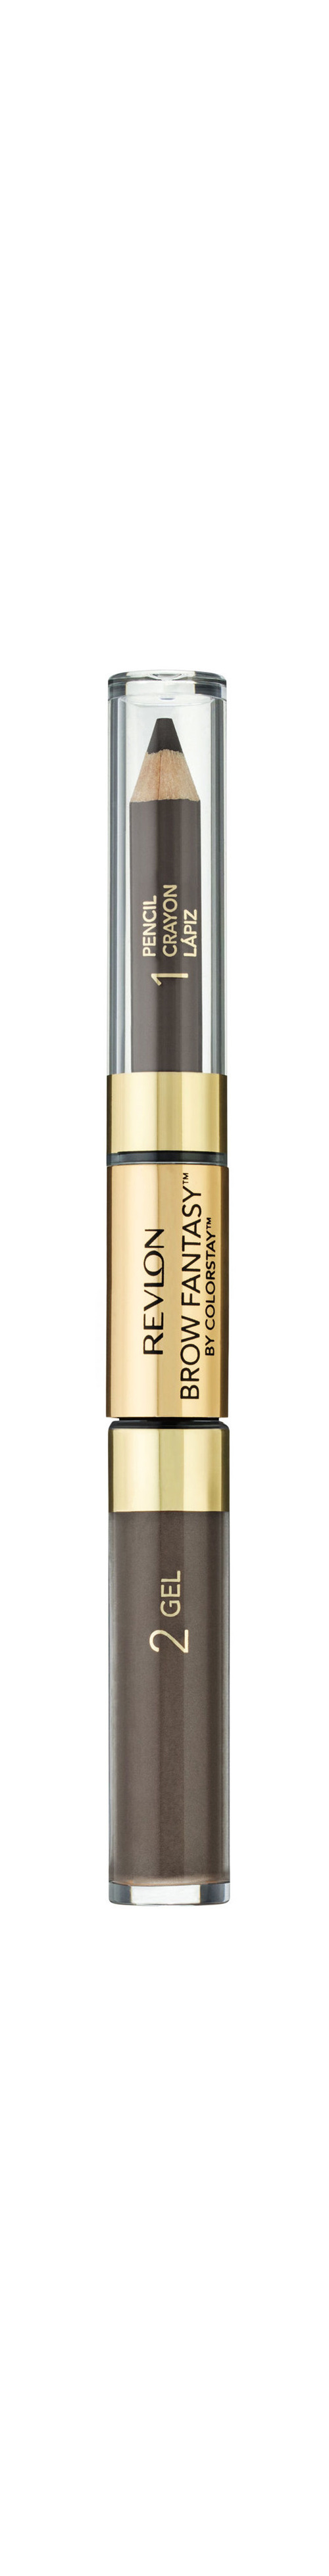 Revlon Brow Fantasy™ Dark Brown